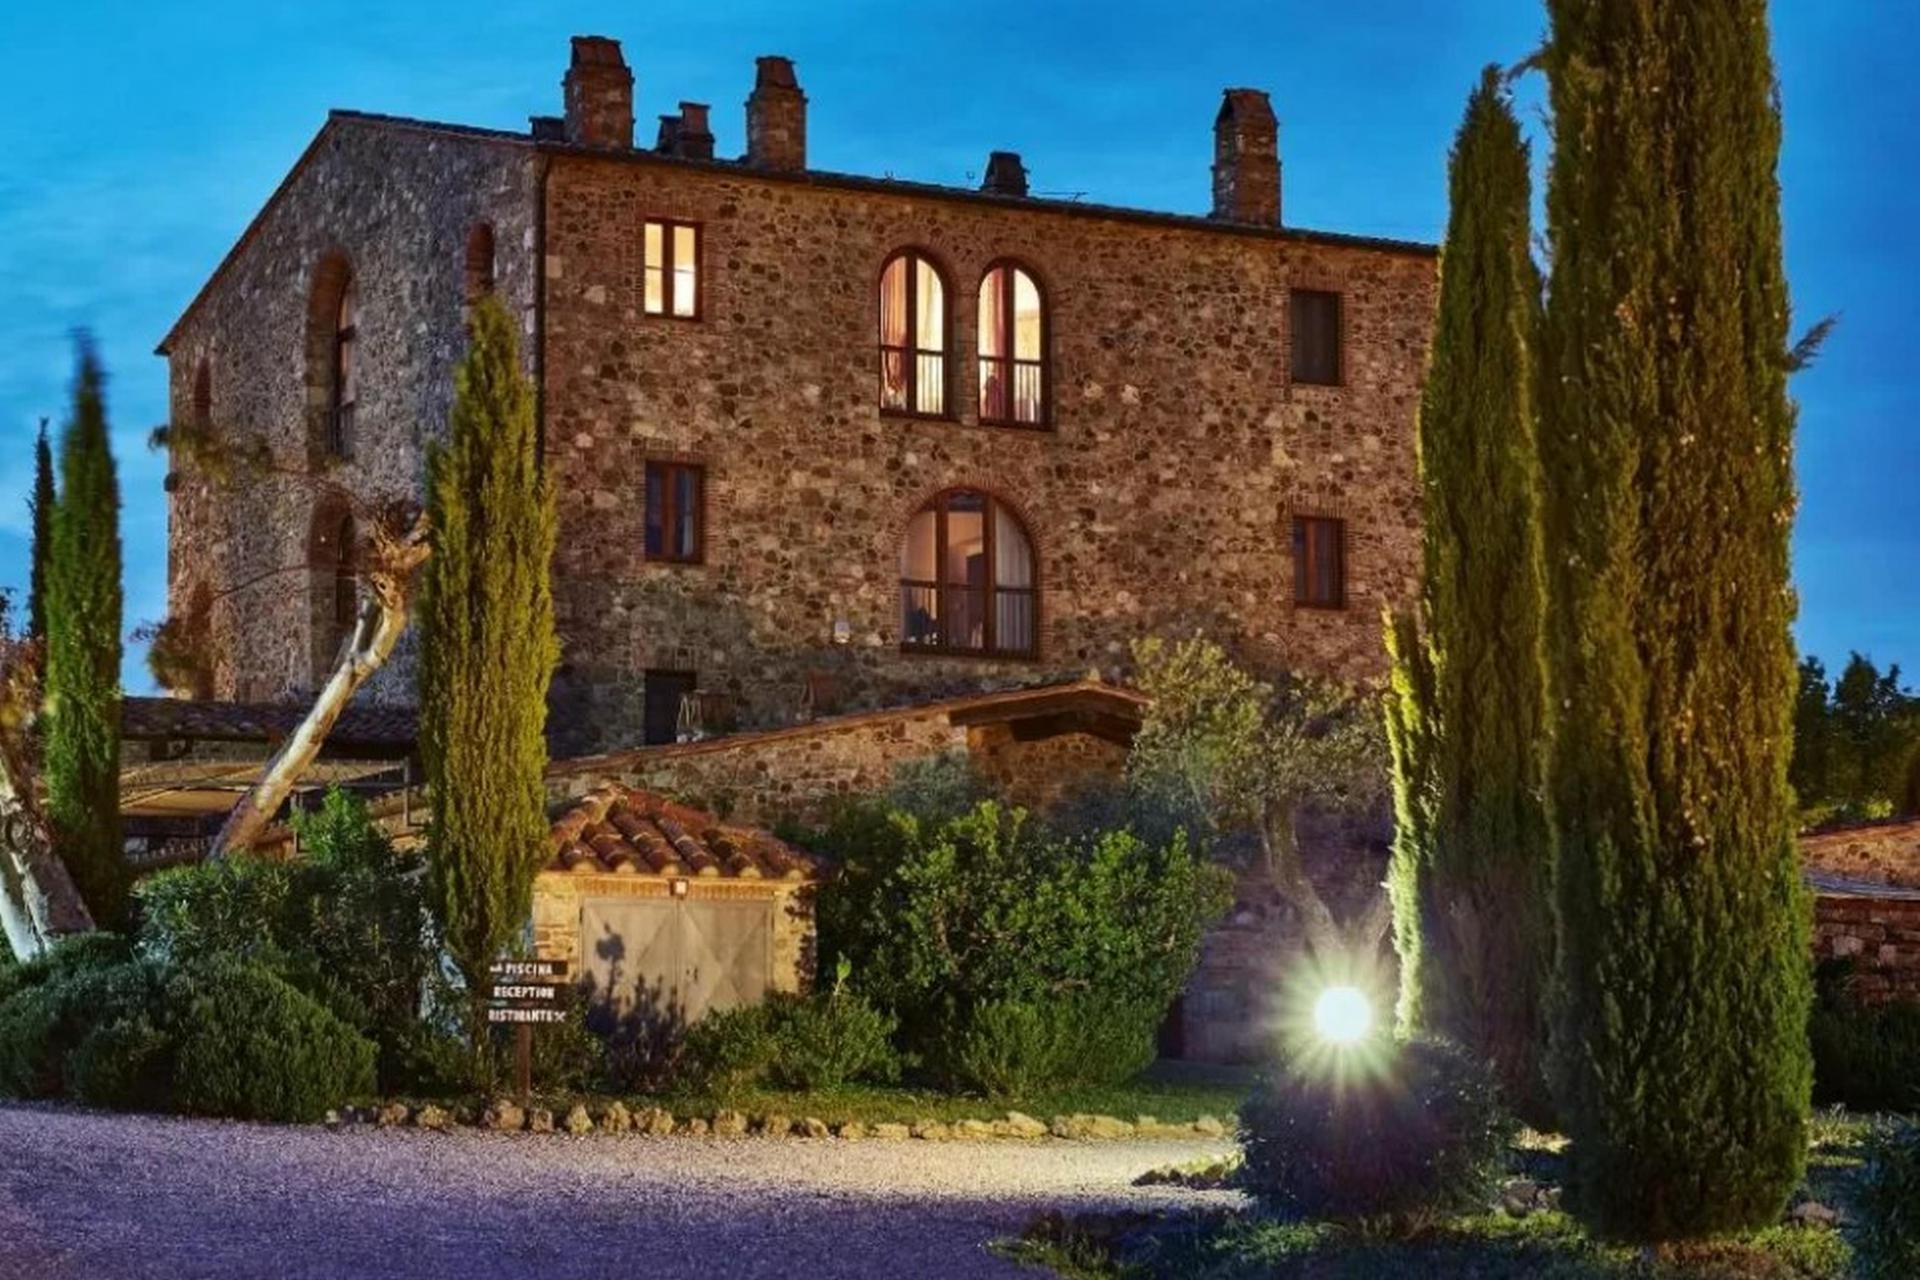 Agriturismo Toscana Agriturismo in posizione tranquilla e rurale in Toscana